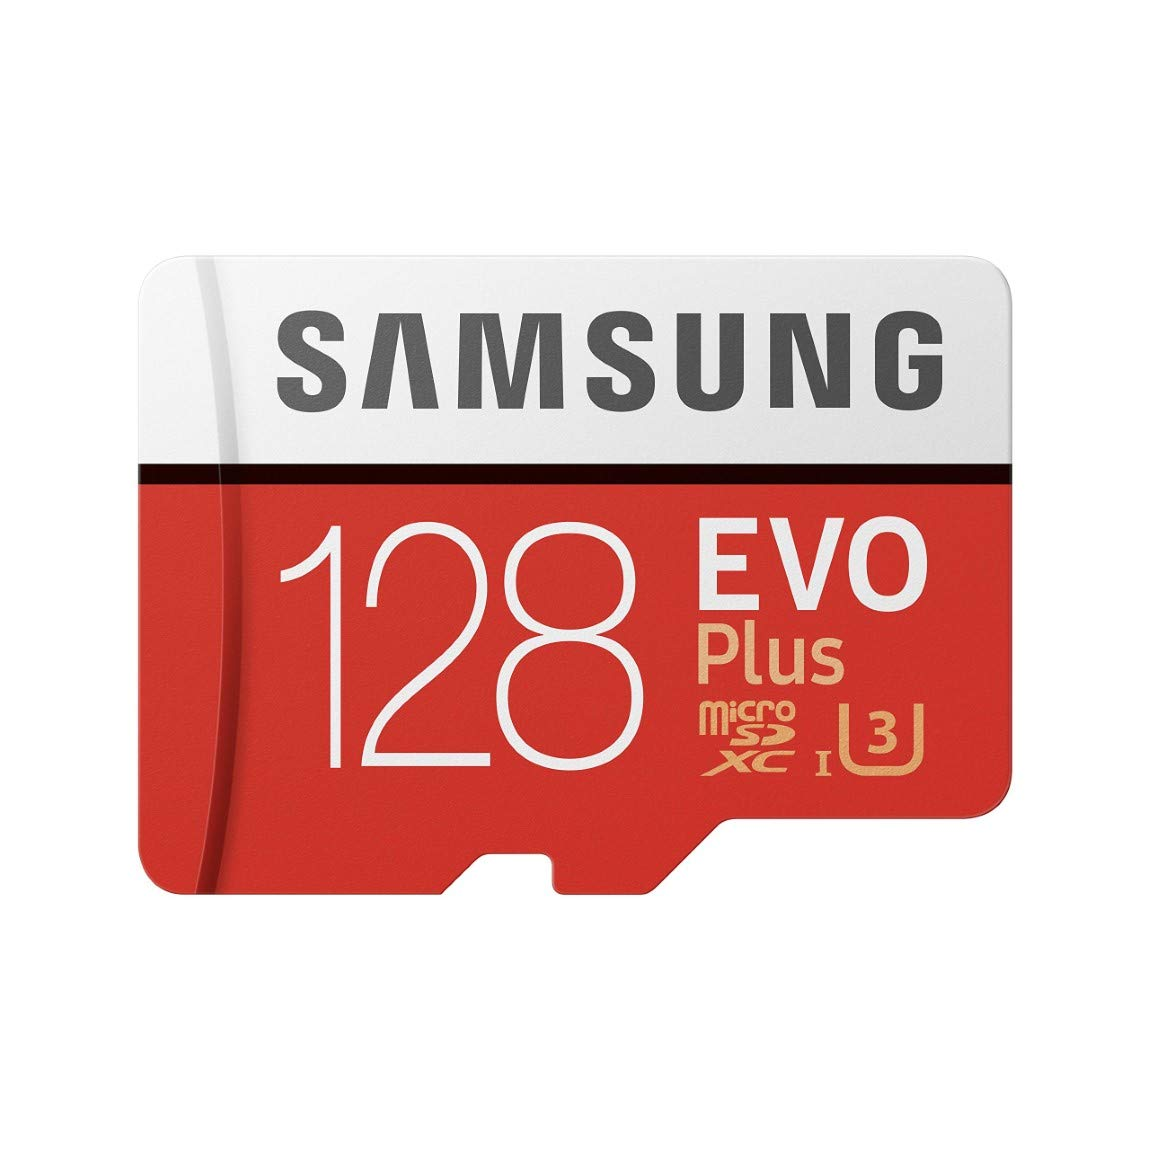 Samsung 128GB EVO Plus Class 10 Micro SDXC with Adapter (MB-MC128GA) by Samsung